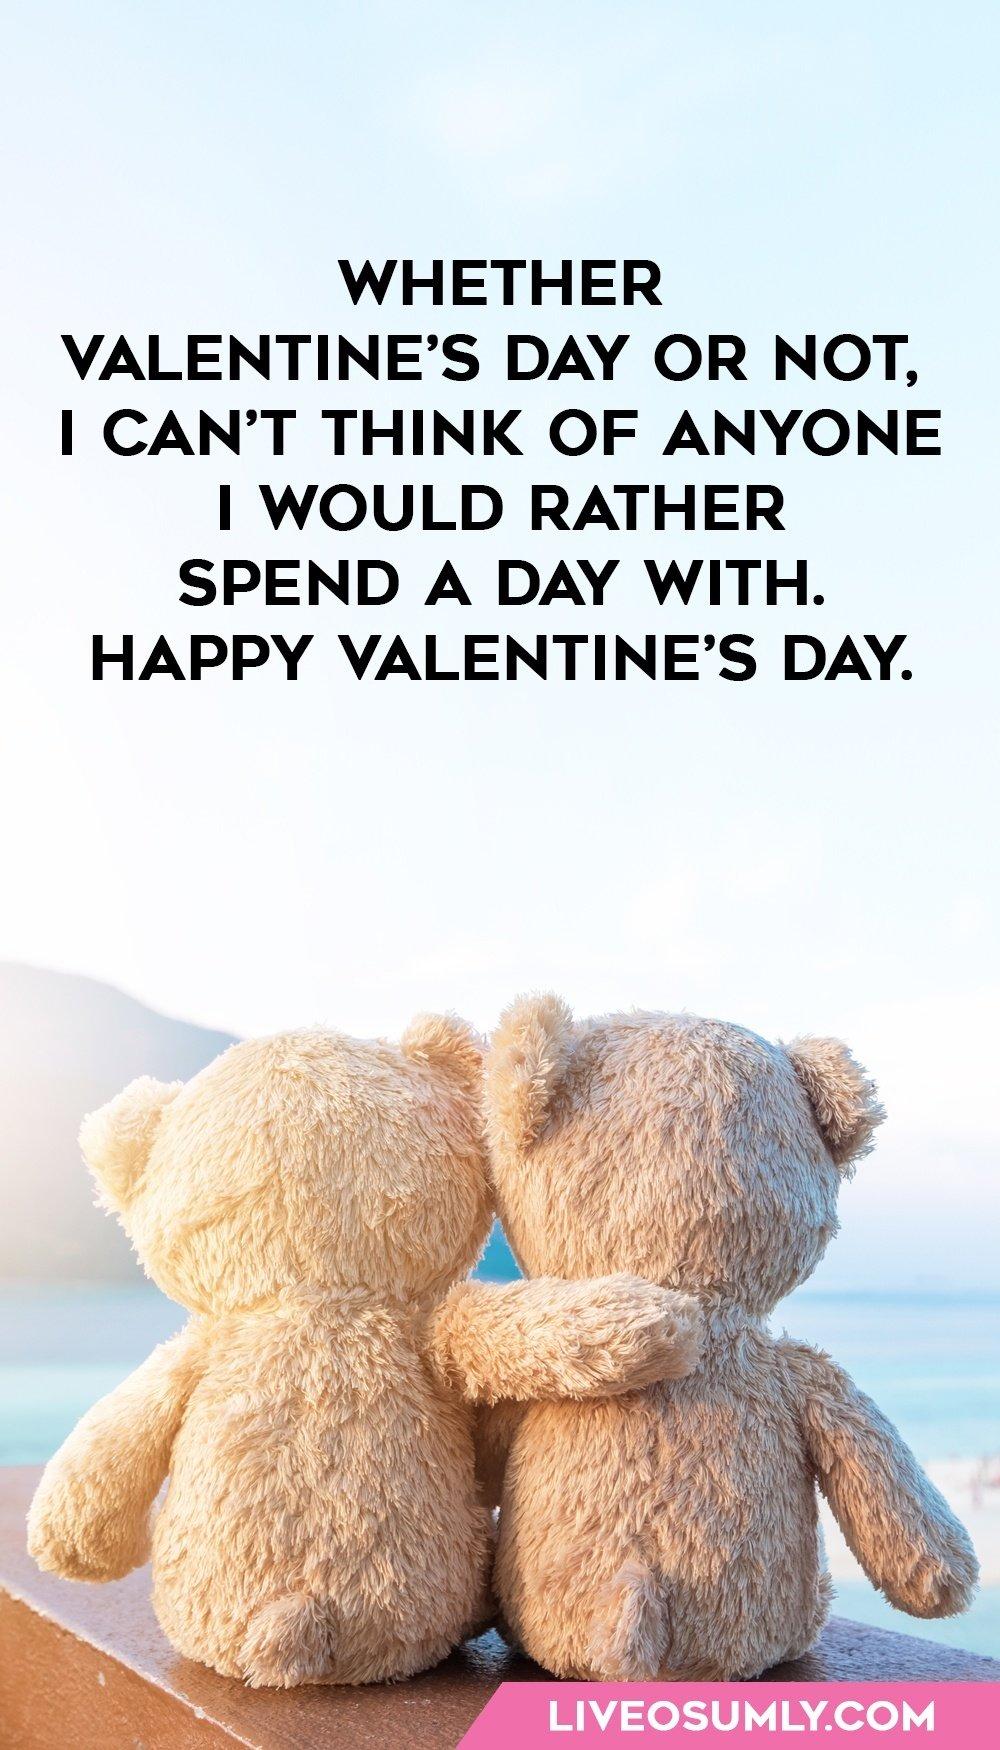 5. Valentines Day Quotes